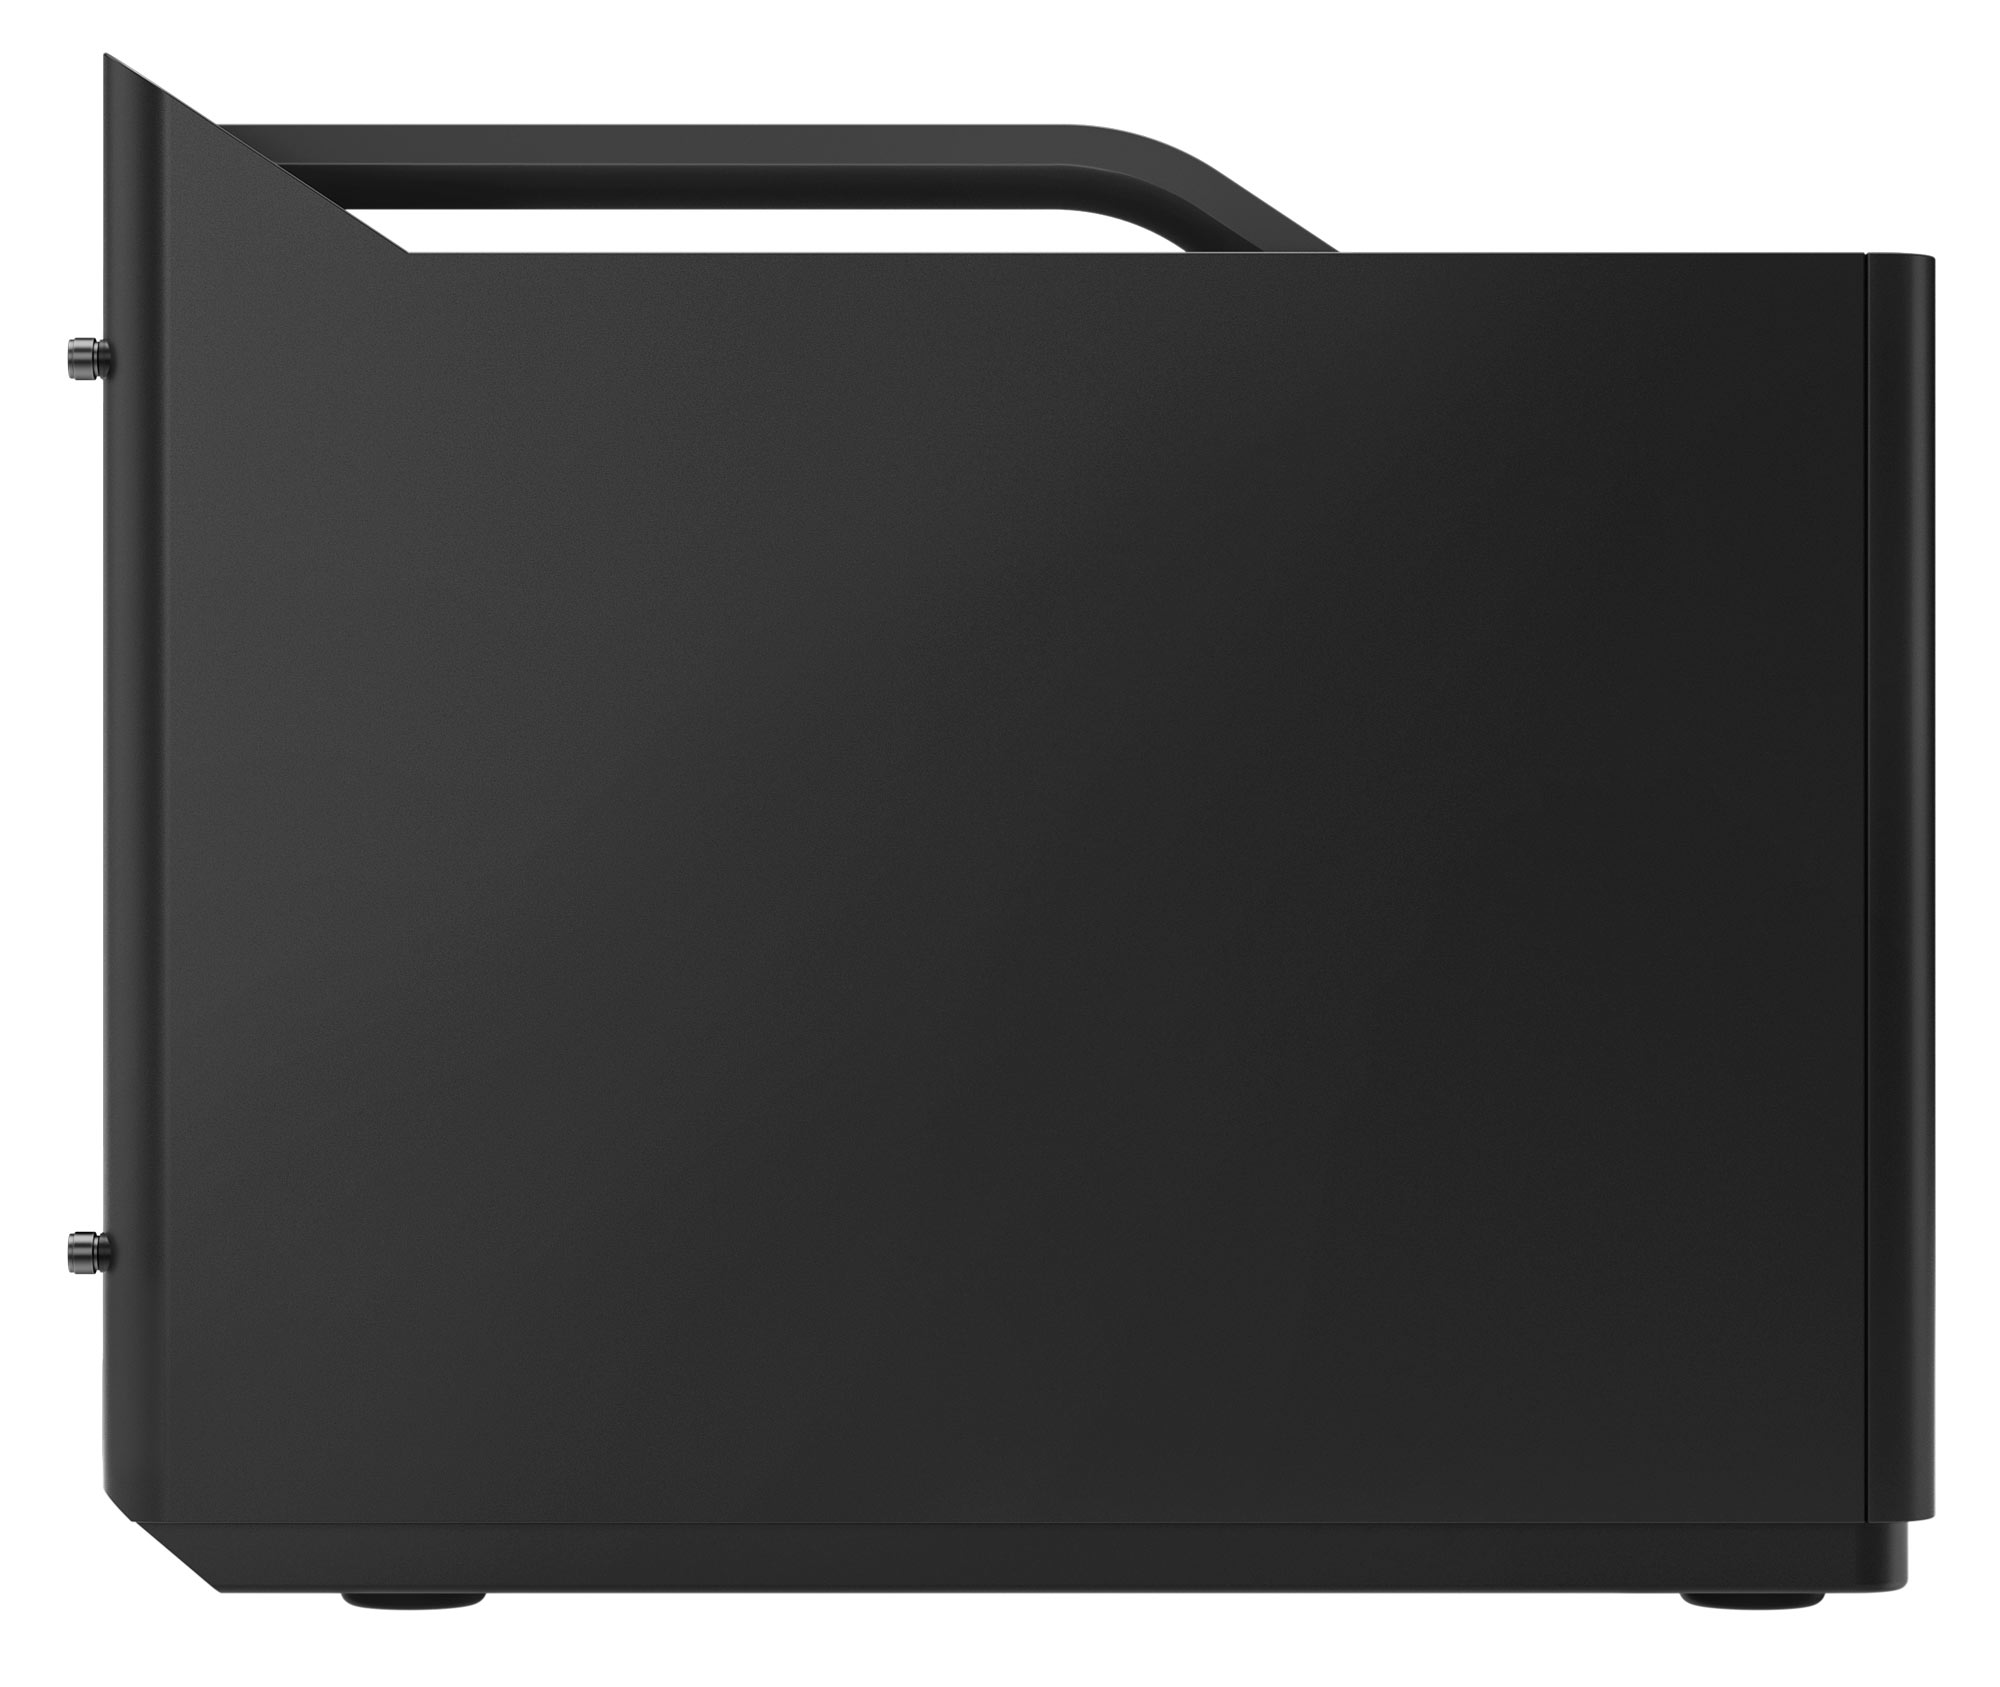 Фото  Компьютер Lenovo Legion C730 Cube (90JH001LUA)